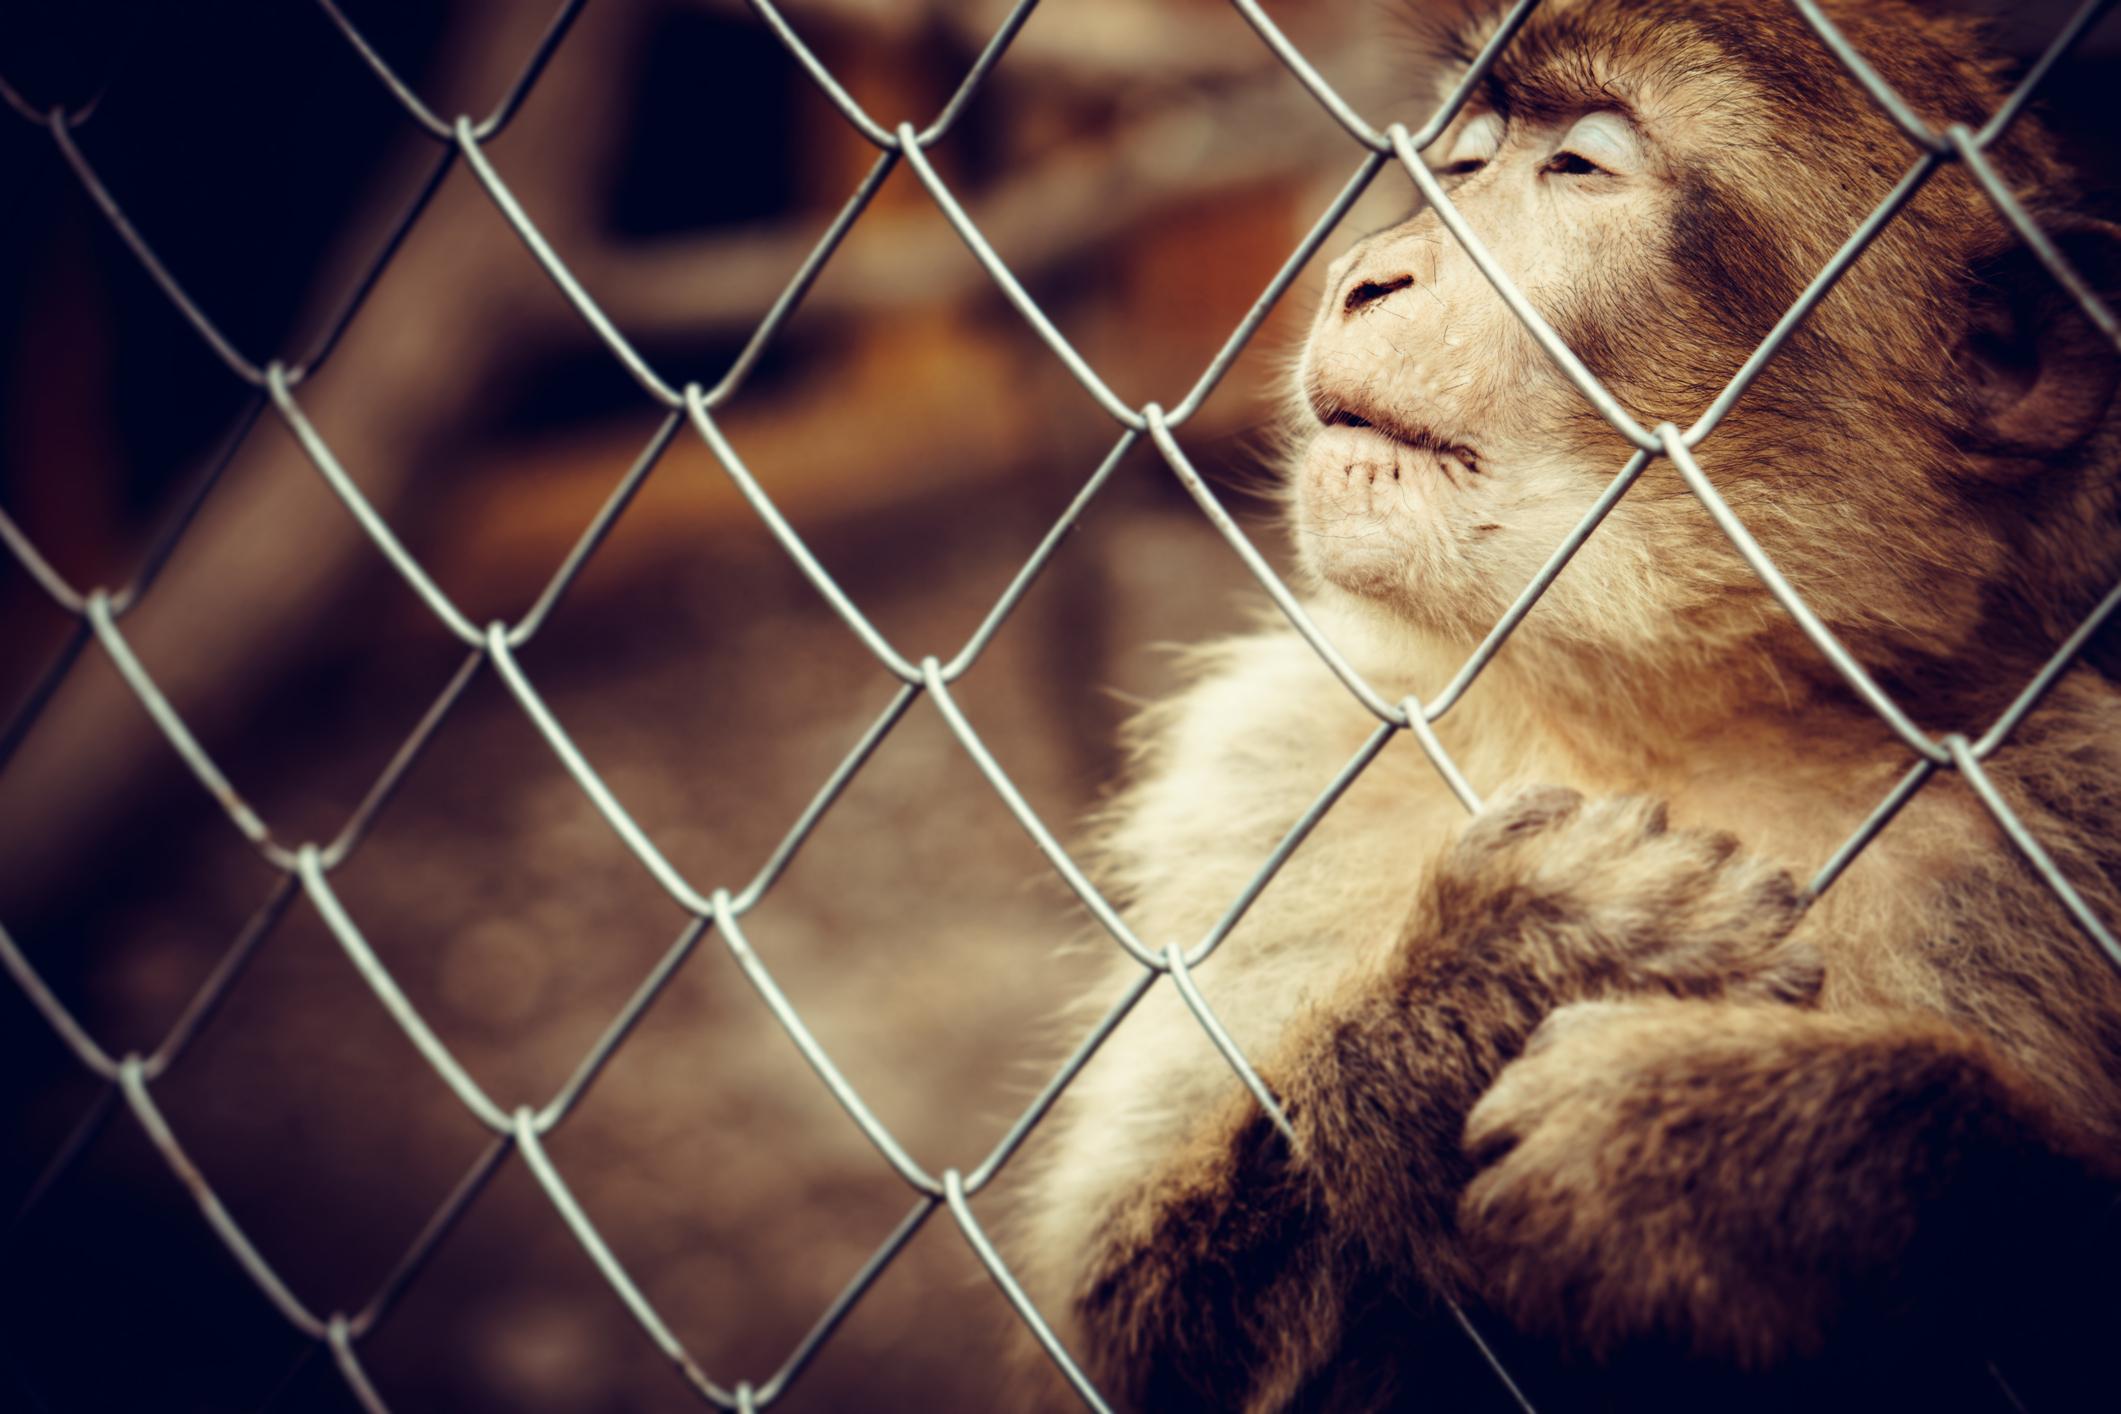 buddhism återfödelse djur